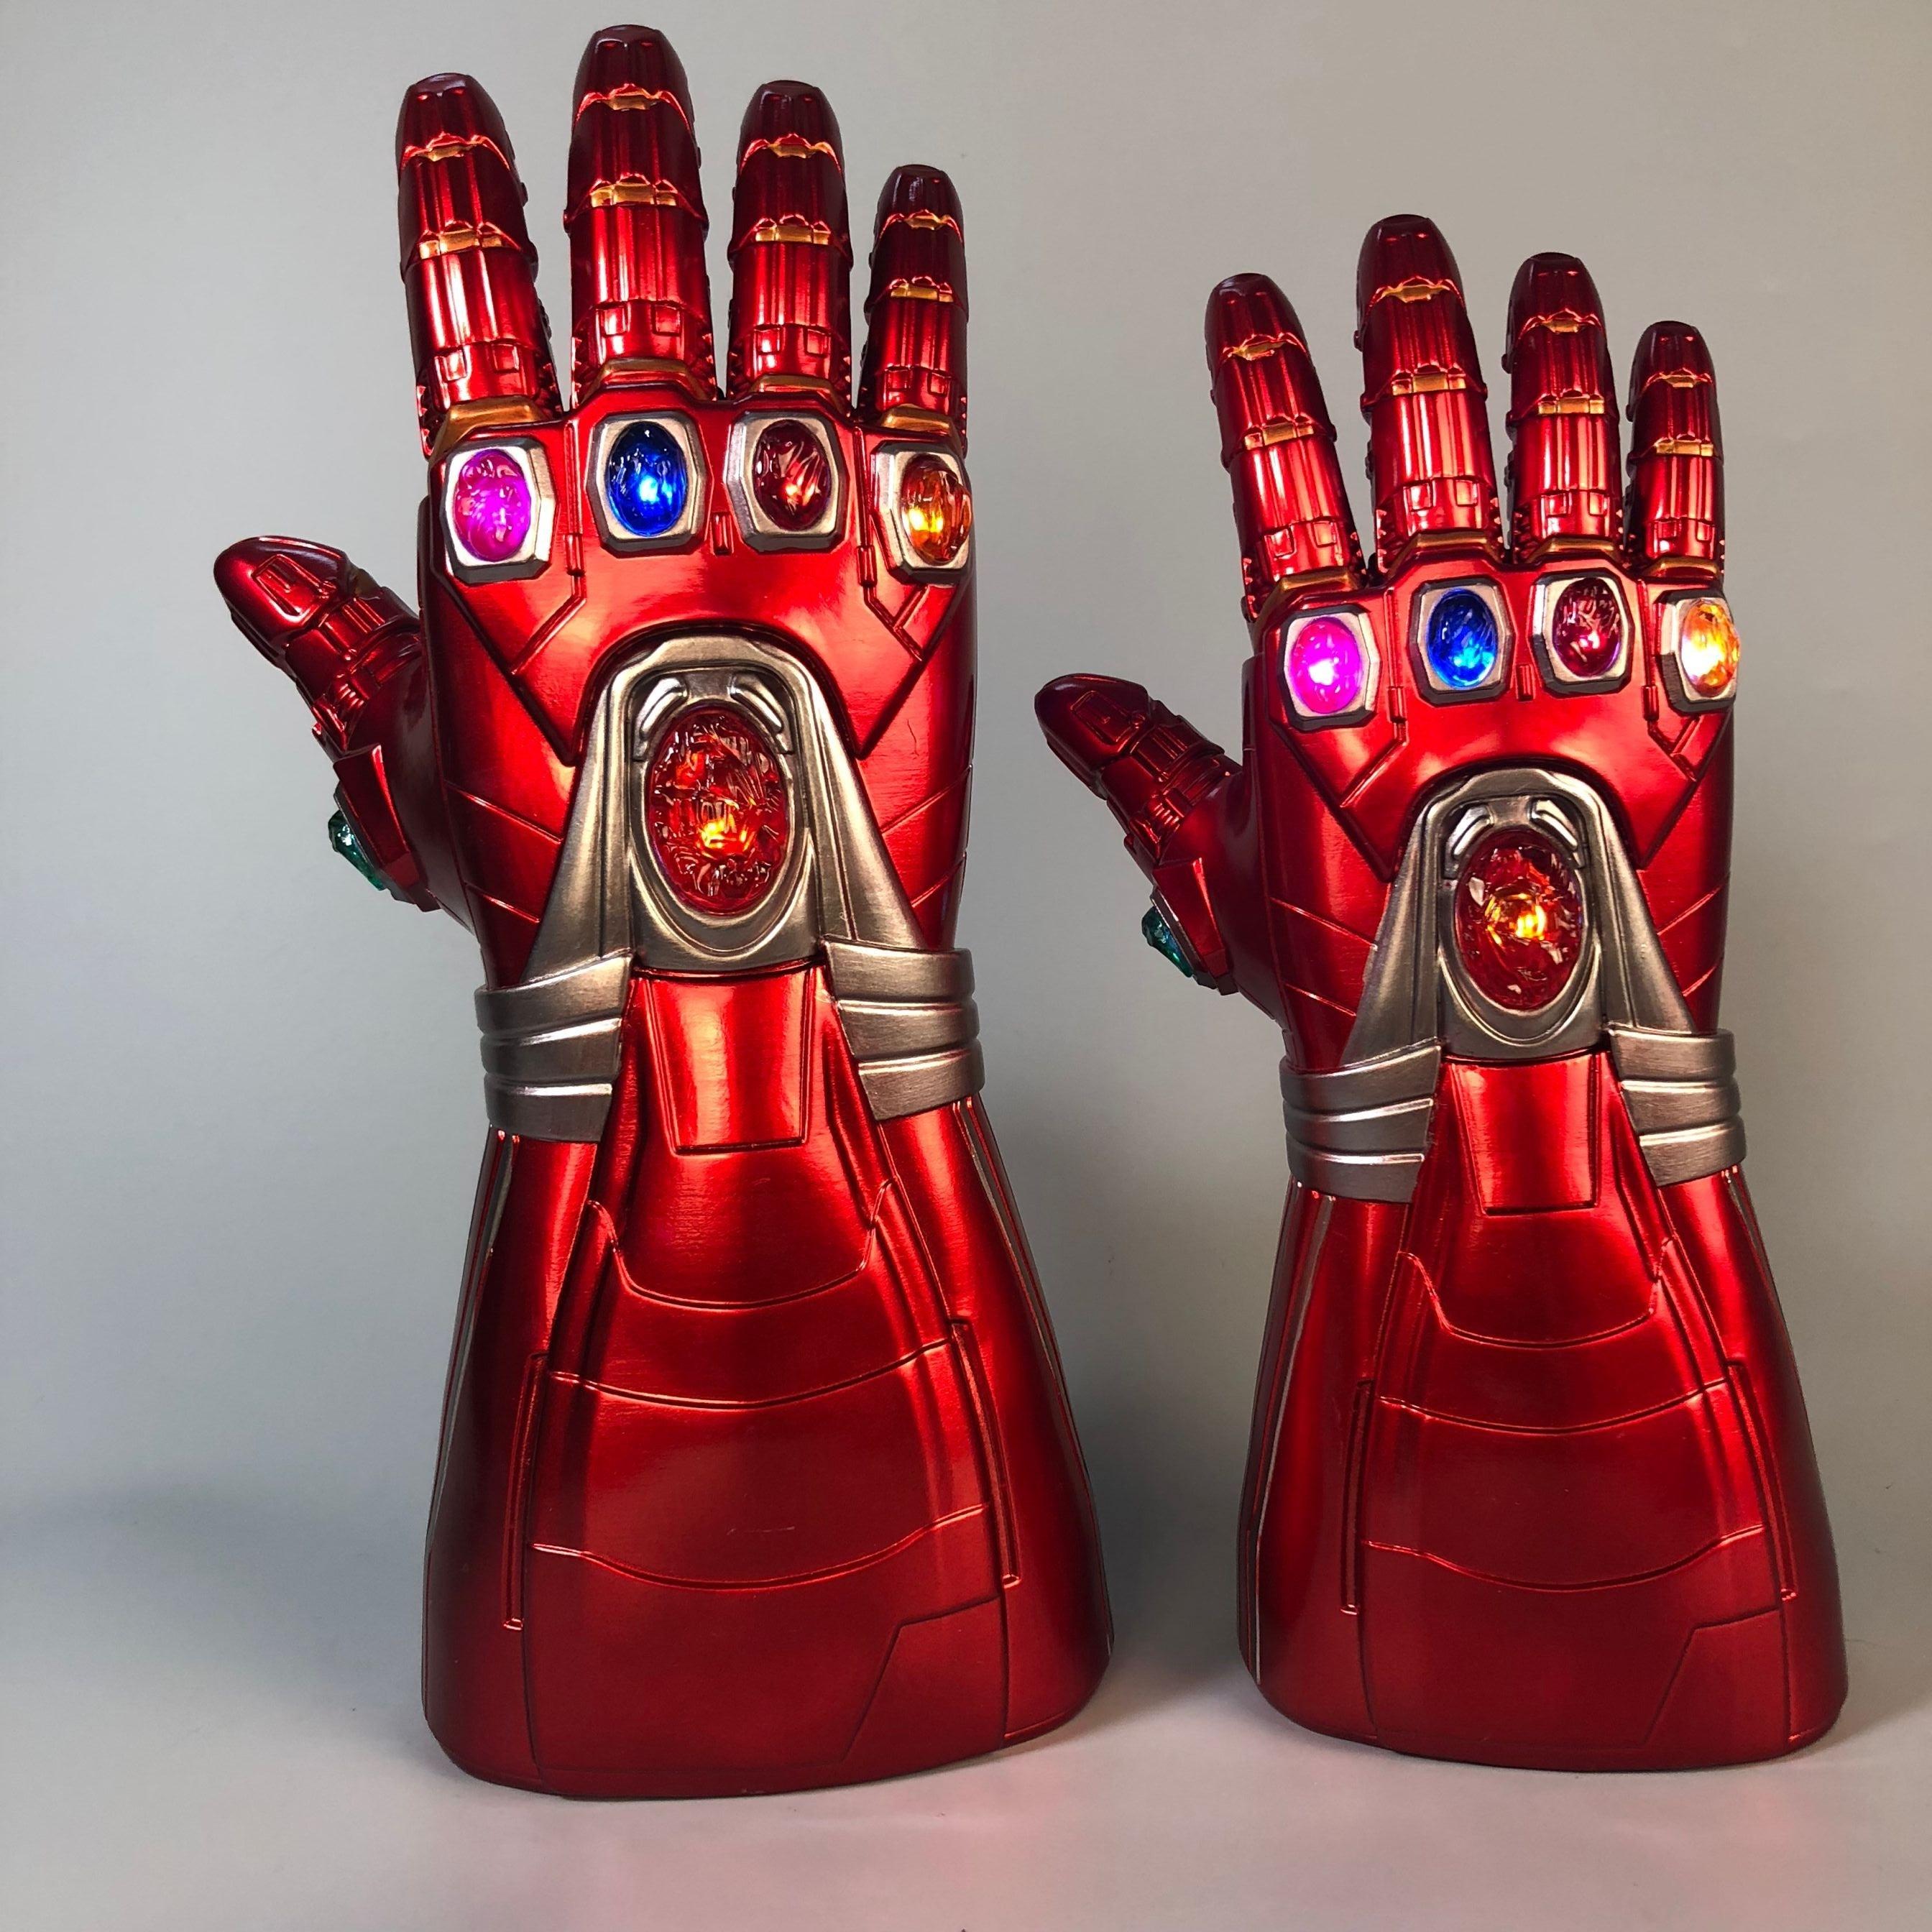 Avengers 4 Endgame Iron Man Tony Stark Led Gloves Infinity Light Up Gauntlet Thanos Infinity Cosplay